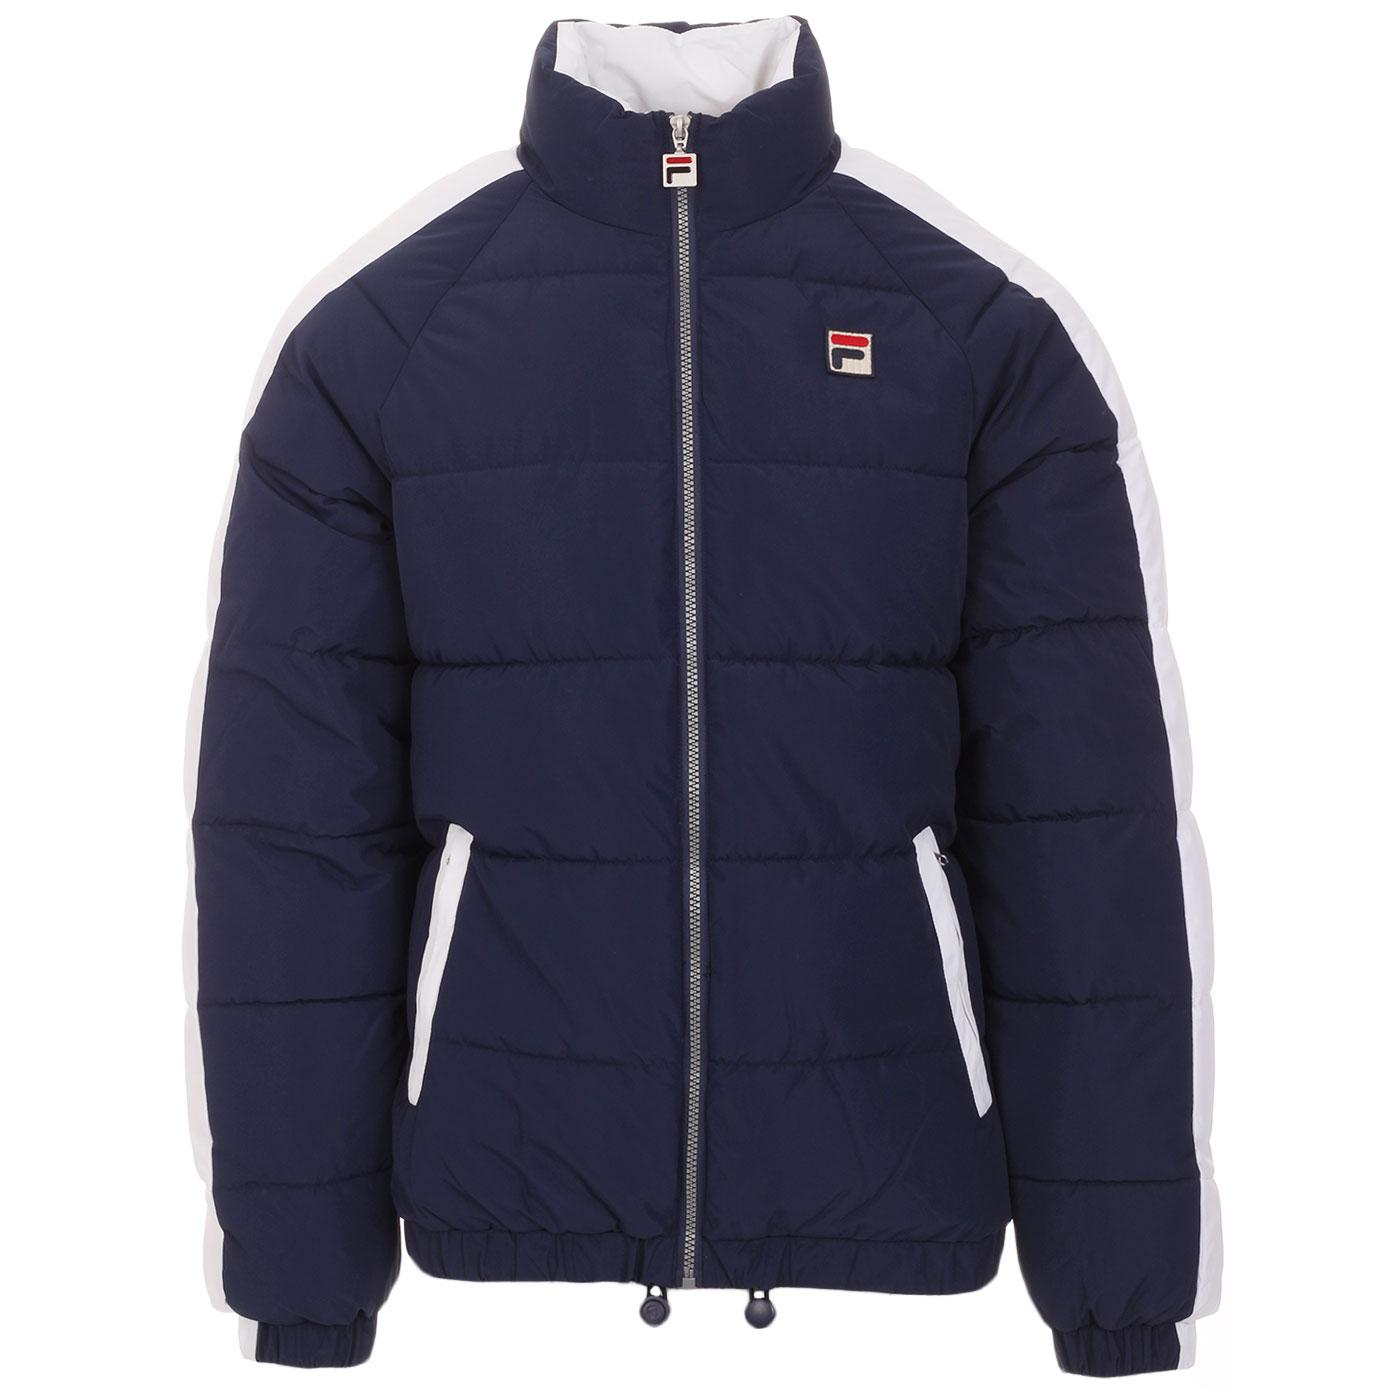 Ledger FILA VINTAGE Retro 1980s Quilted Jacket (P)